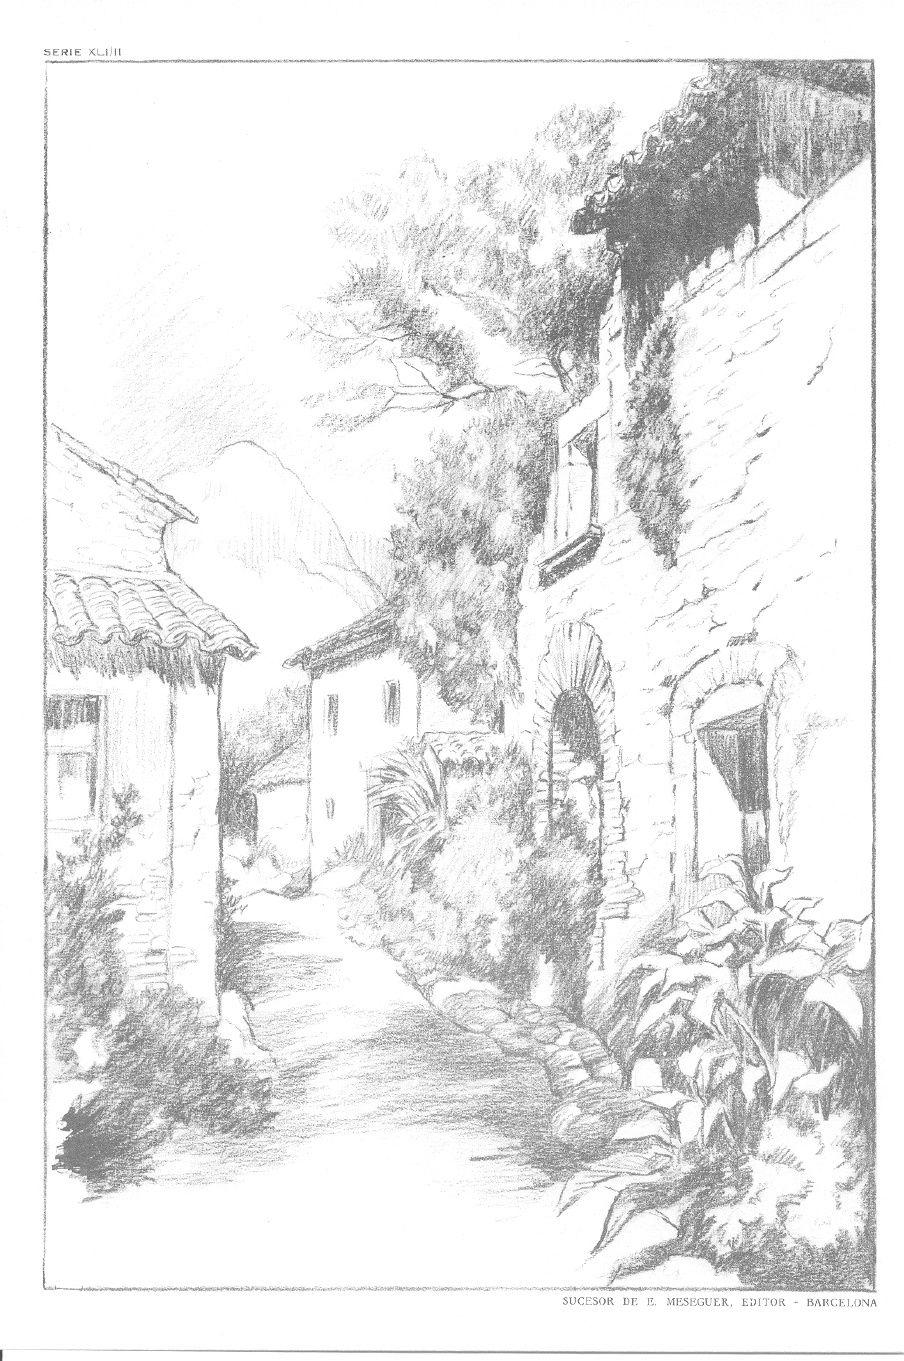 Dibujo Emilio Freixas Láminas Serie 41 Paisajes Iii Paisaje Para Pintar Paisaje A Lapiz Carboncillo Paisaje